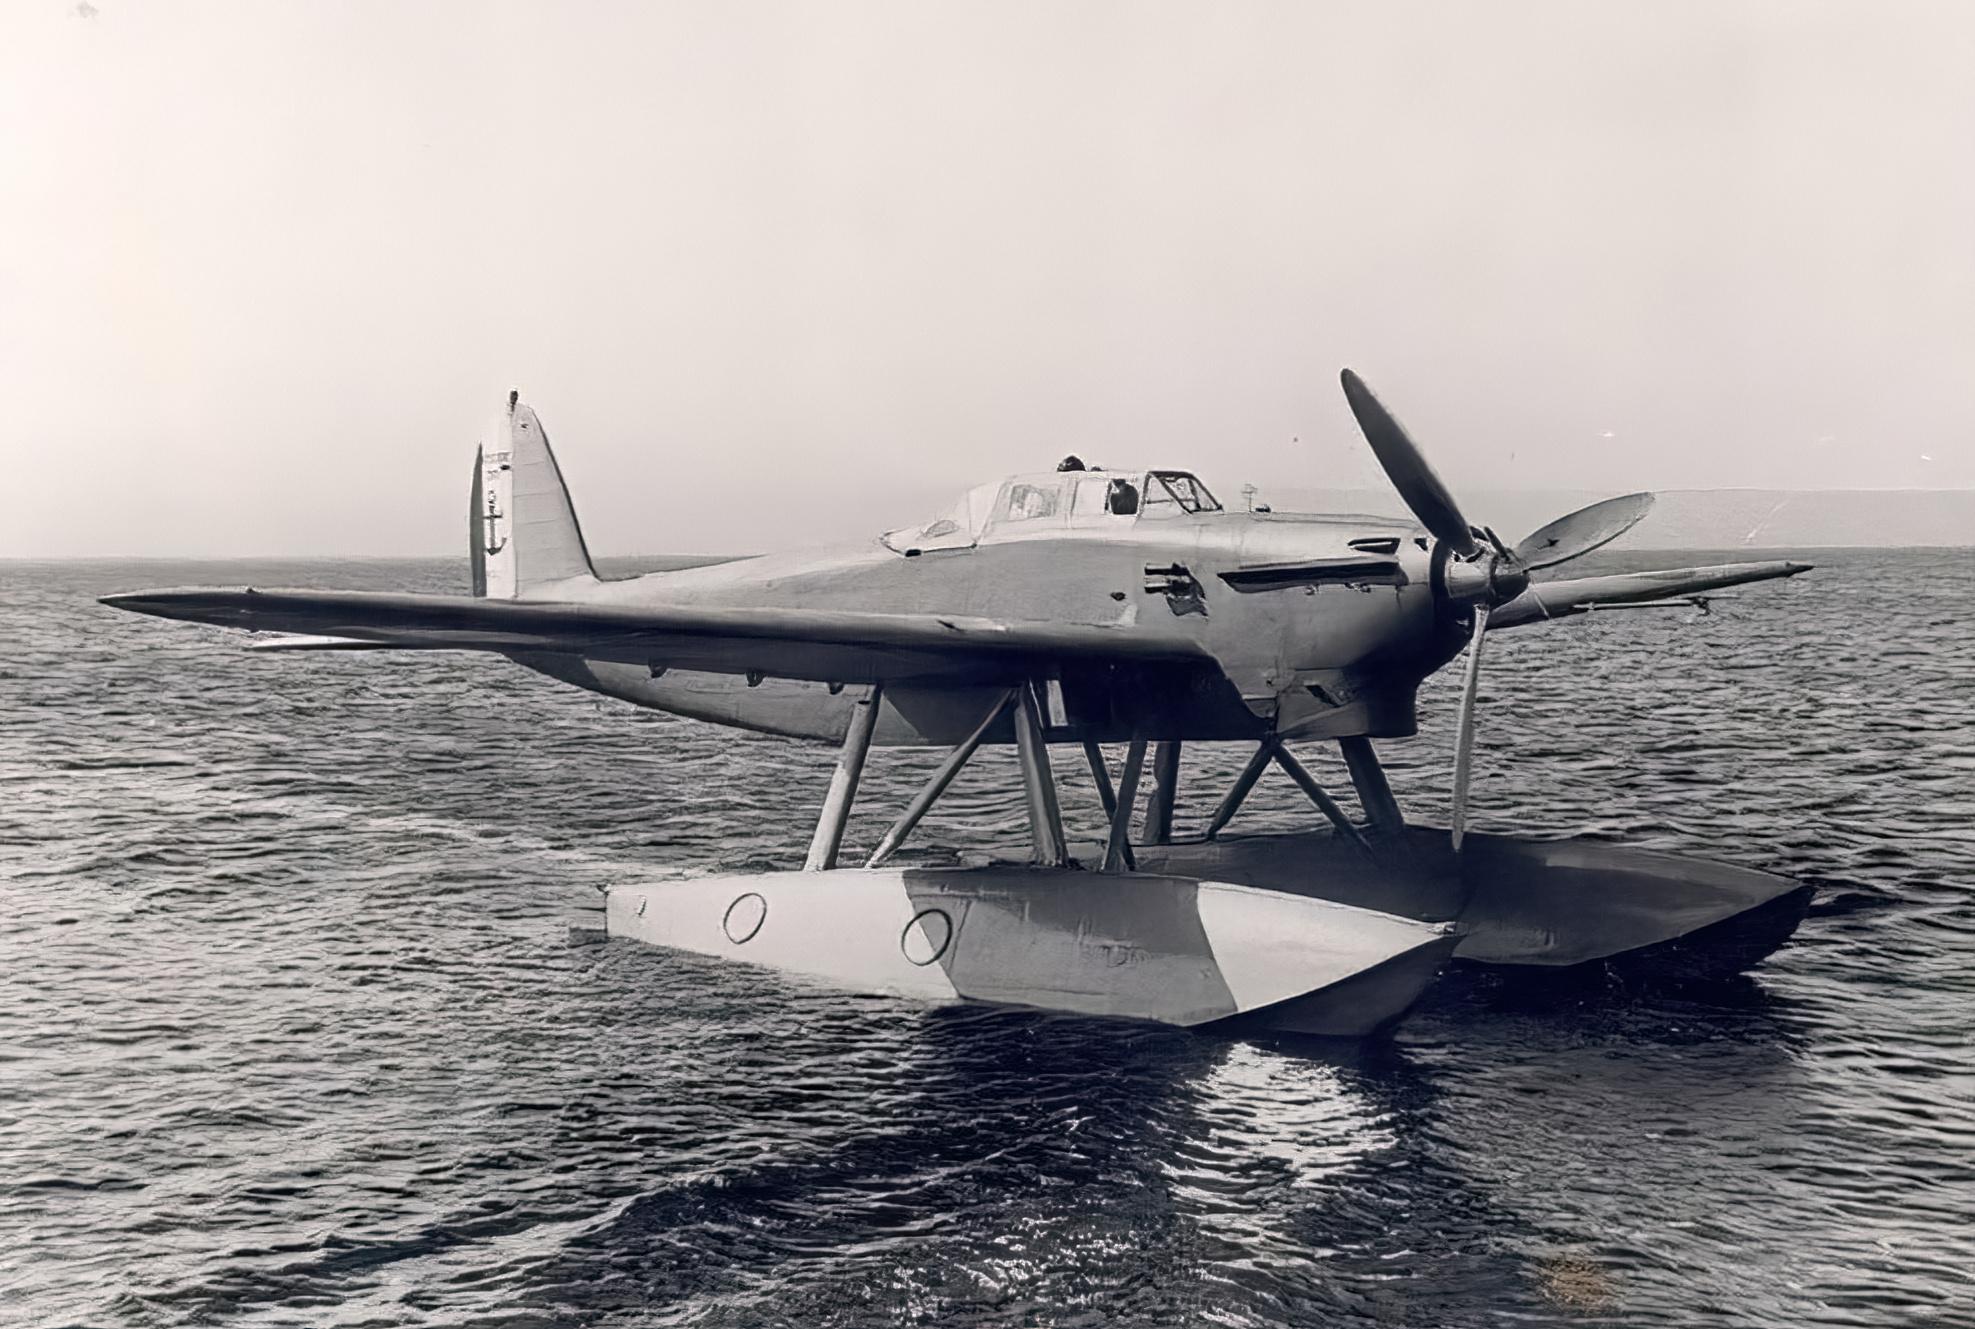 French Navy Latecoere 298 sn01 Aeronautique Navale prototype torpedo bomber seaplane ebay 02